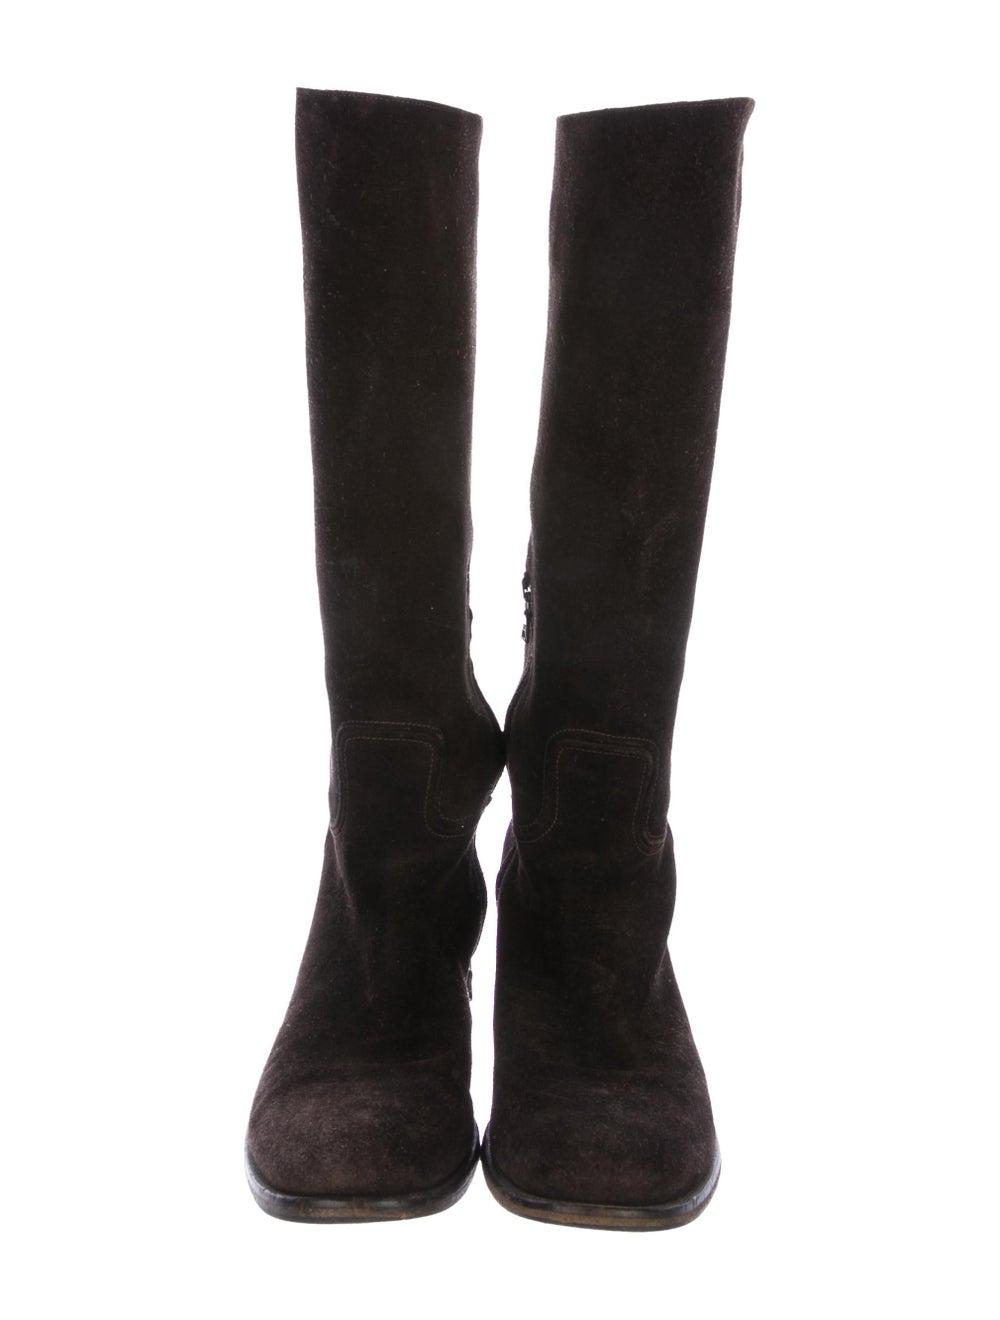 Prada Suede Knee-High Boots - image 3